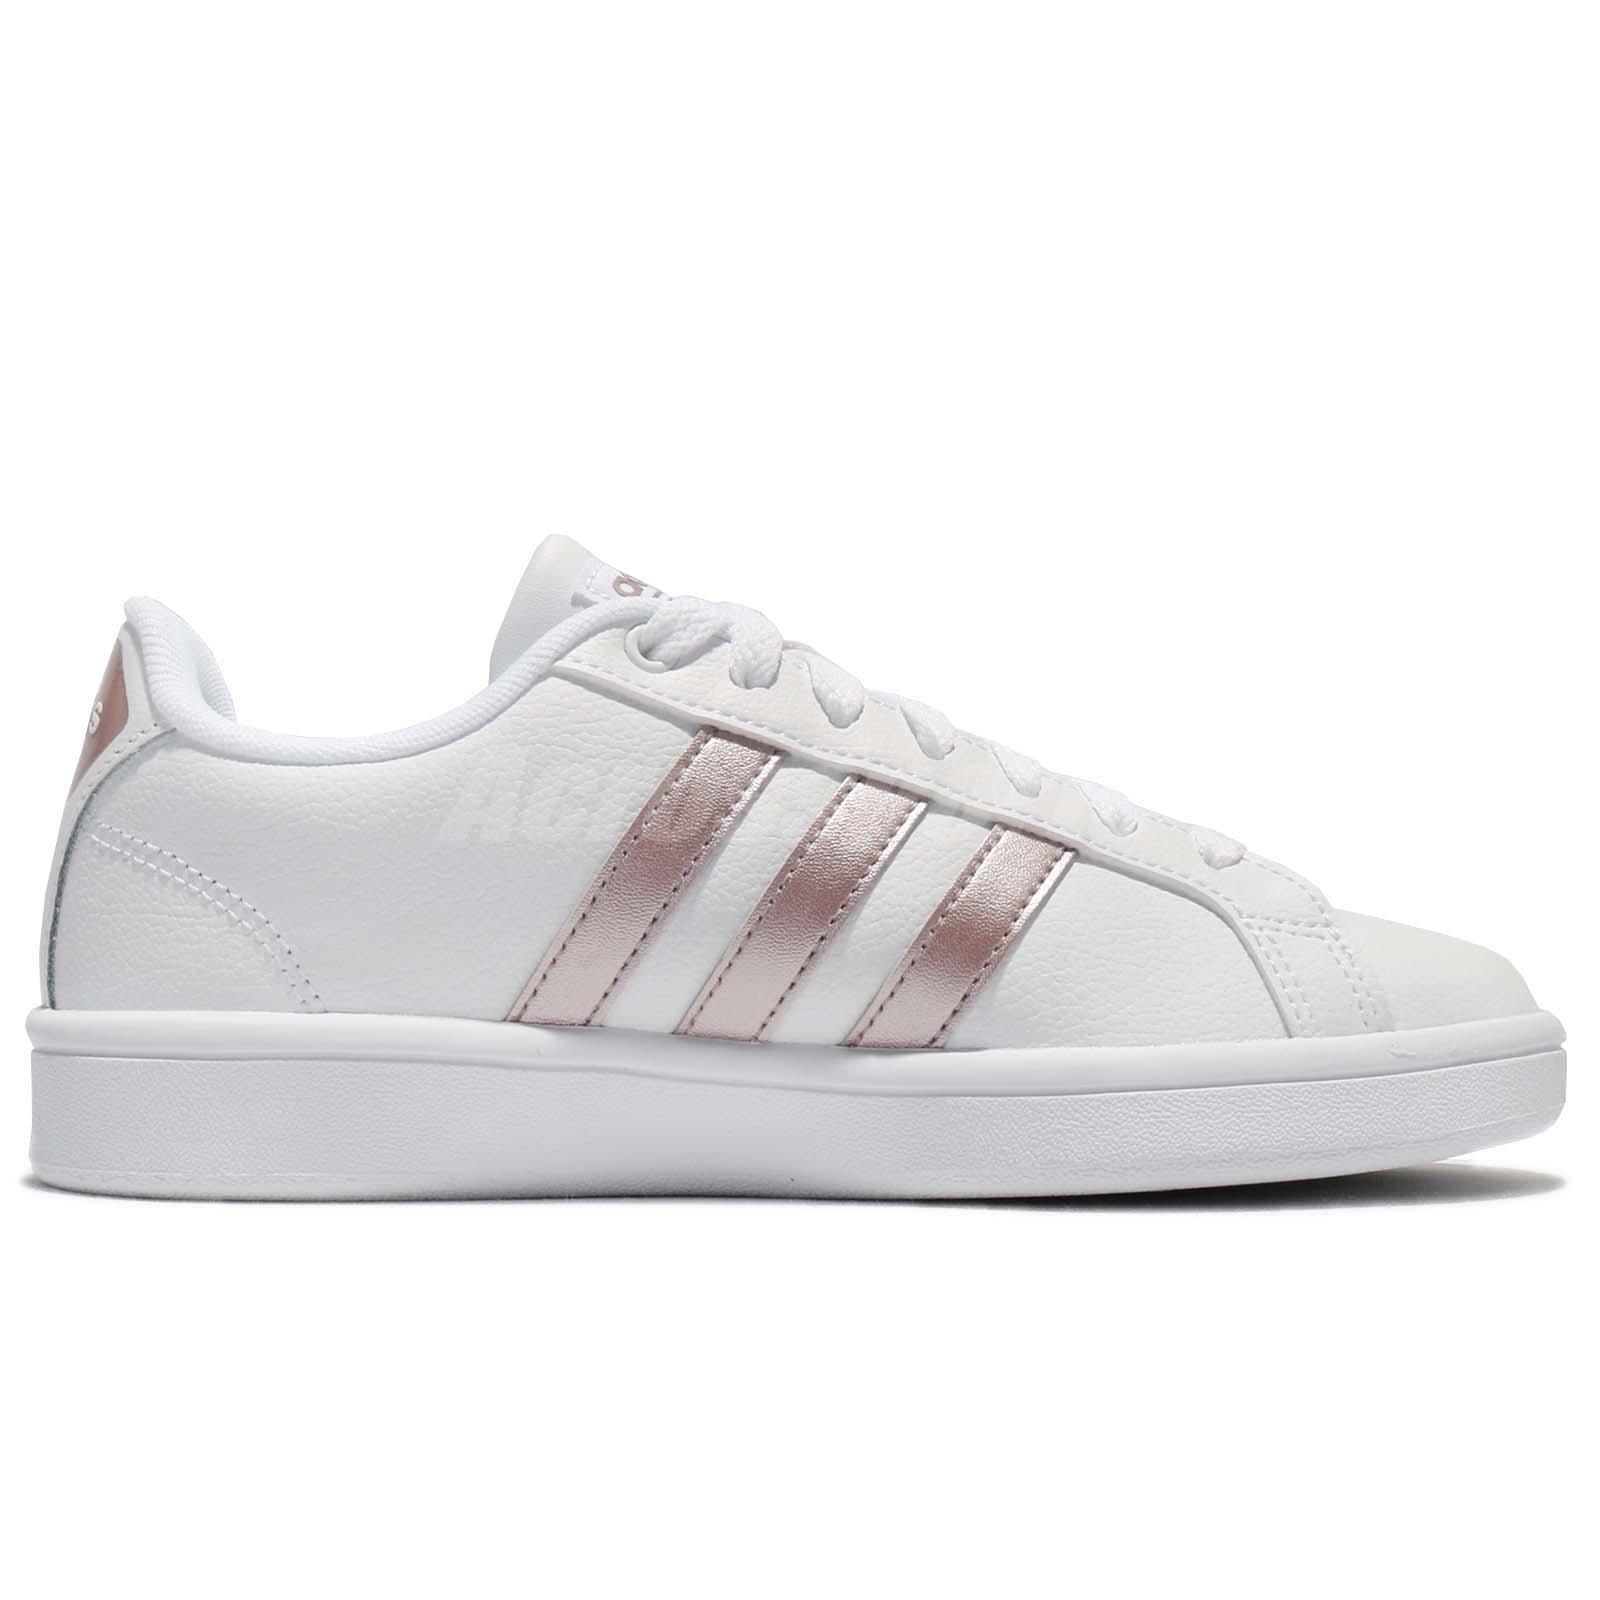 adidas cf advantage vapor grey metallic pink women shoes sneakers da9524 ebay. Black Bedroom Furniture Sets. Home Design Ideas